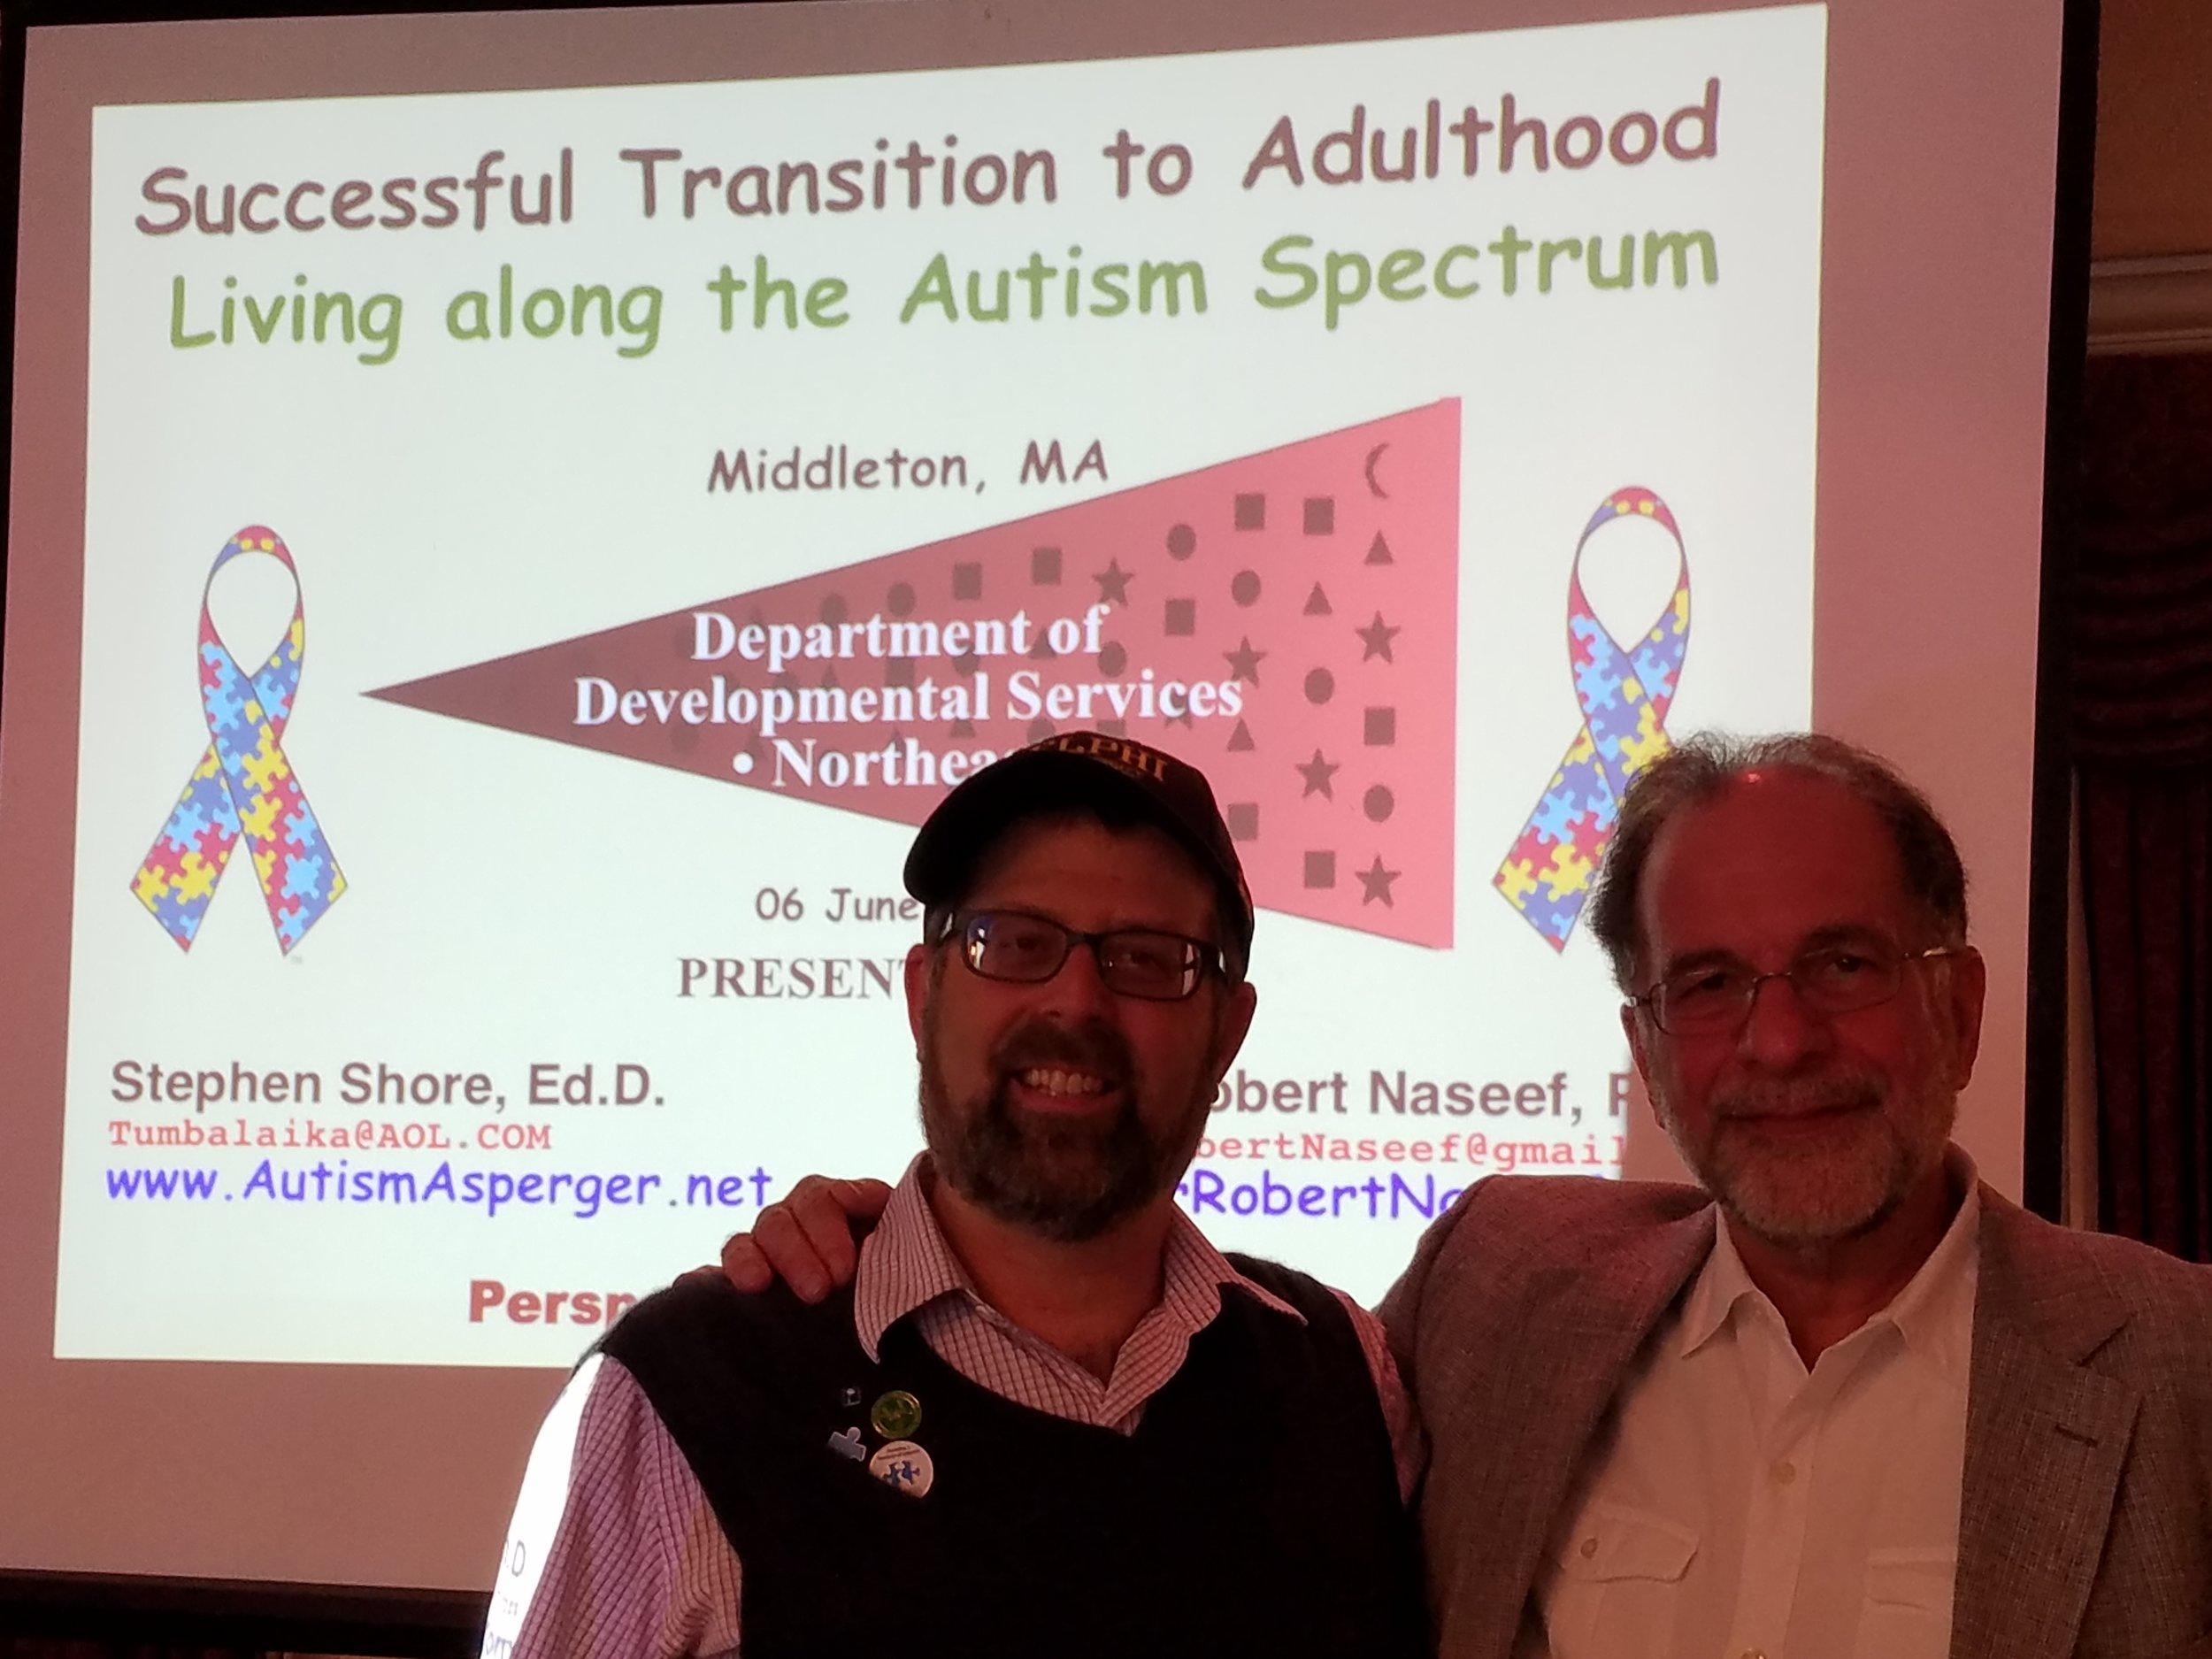 2013, Living Along the Autism Spectrum co-presentation with Stephen Shore.